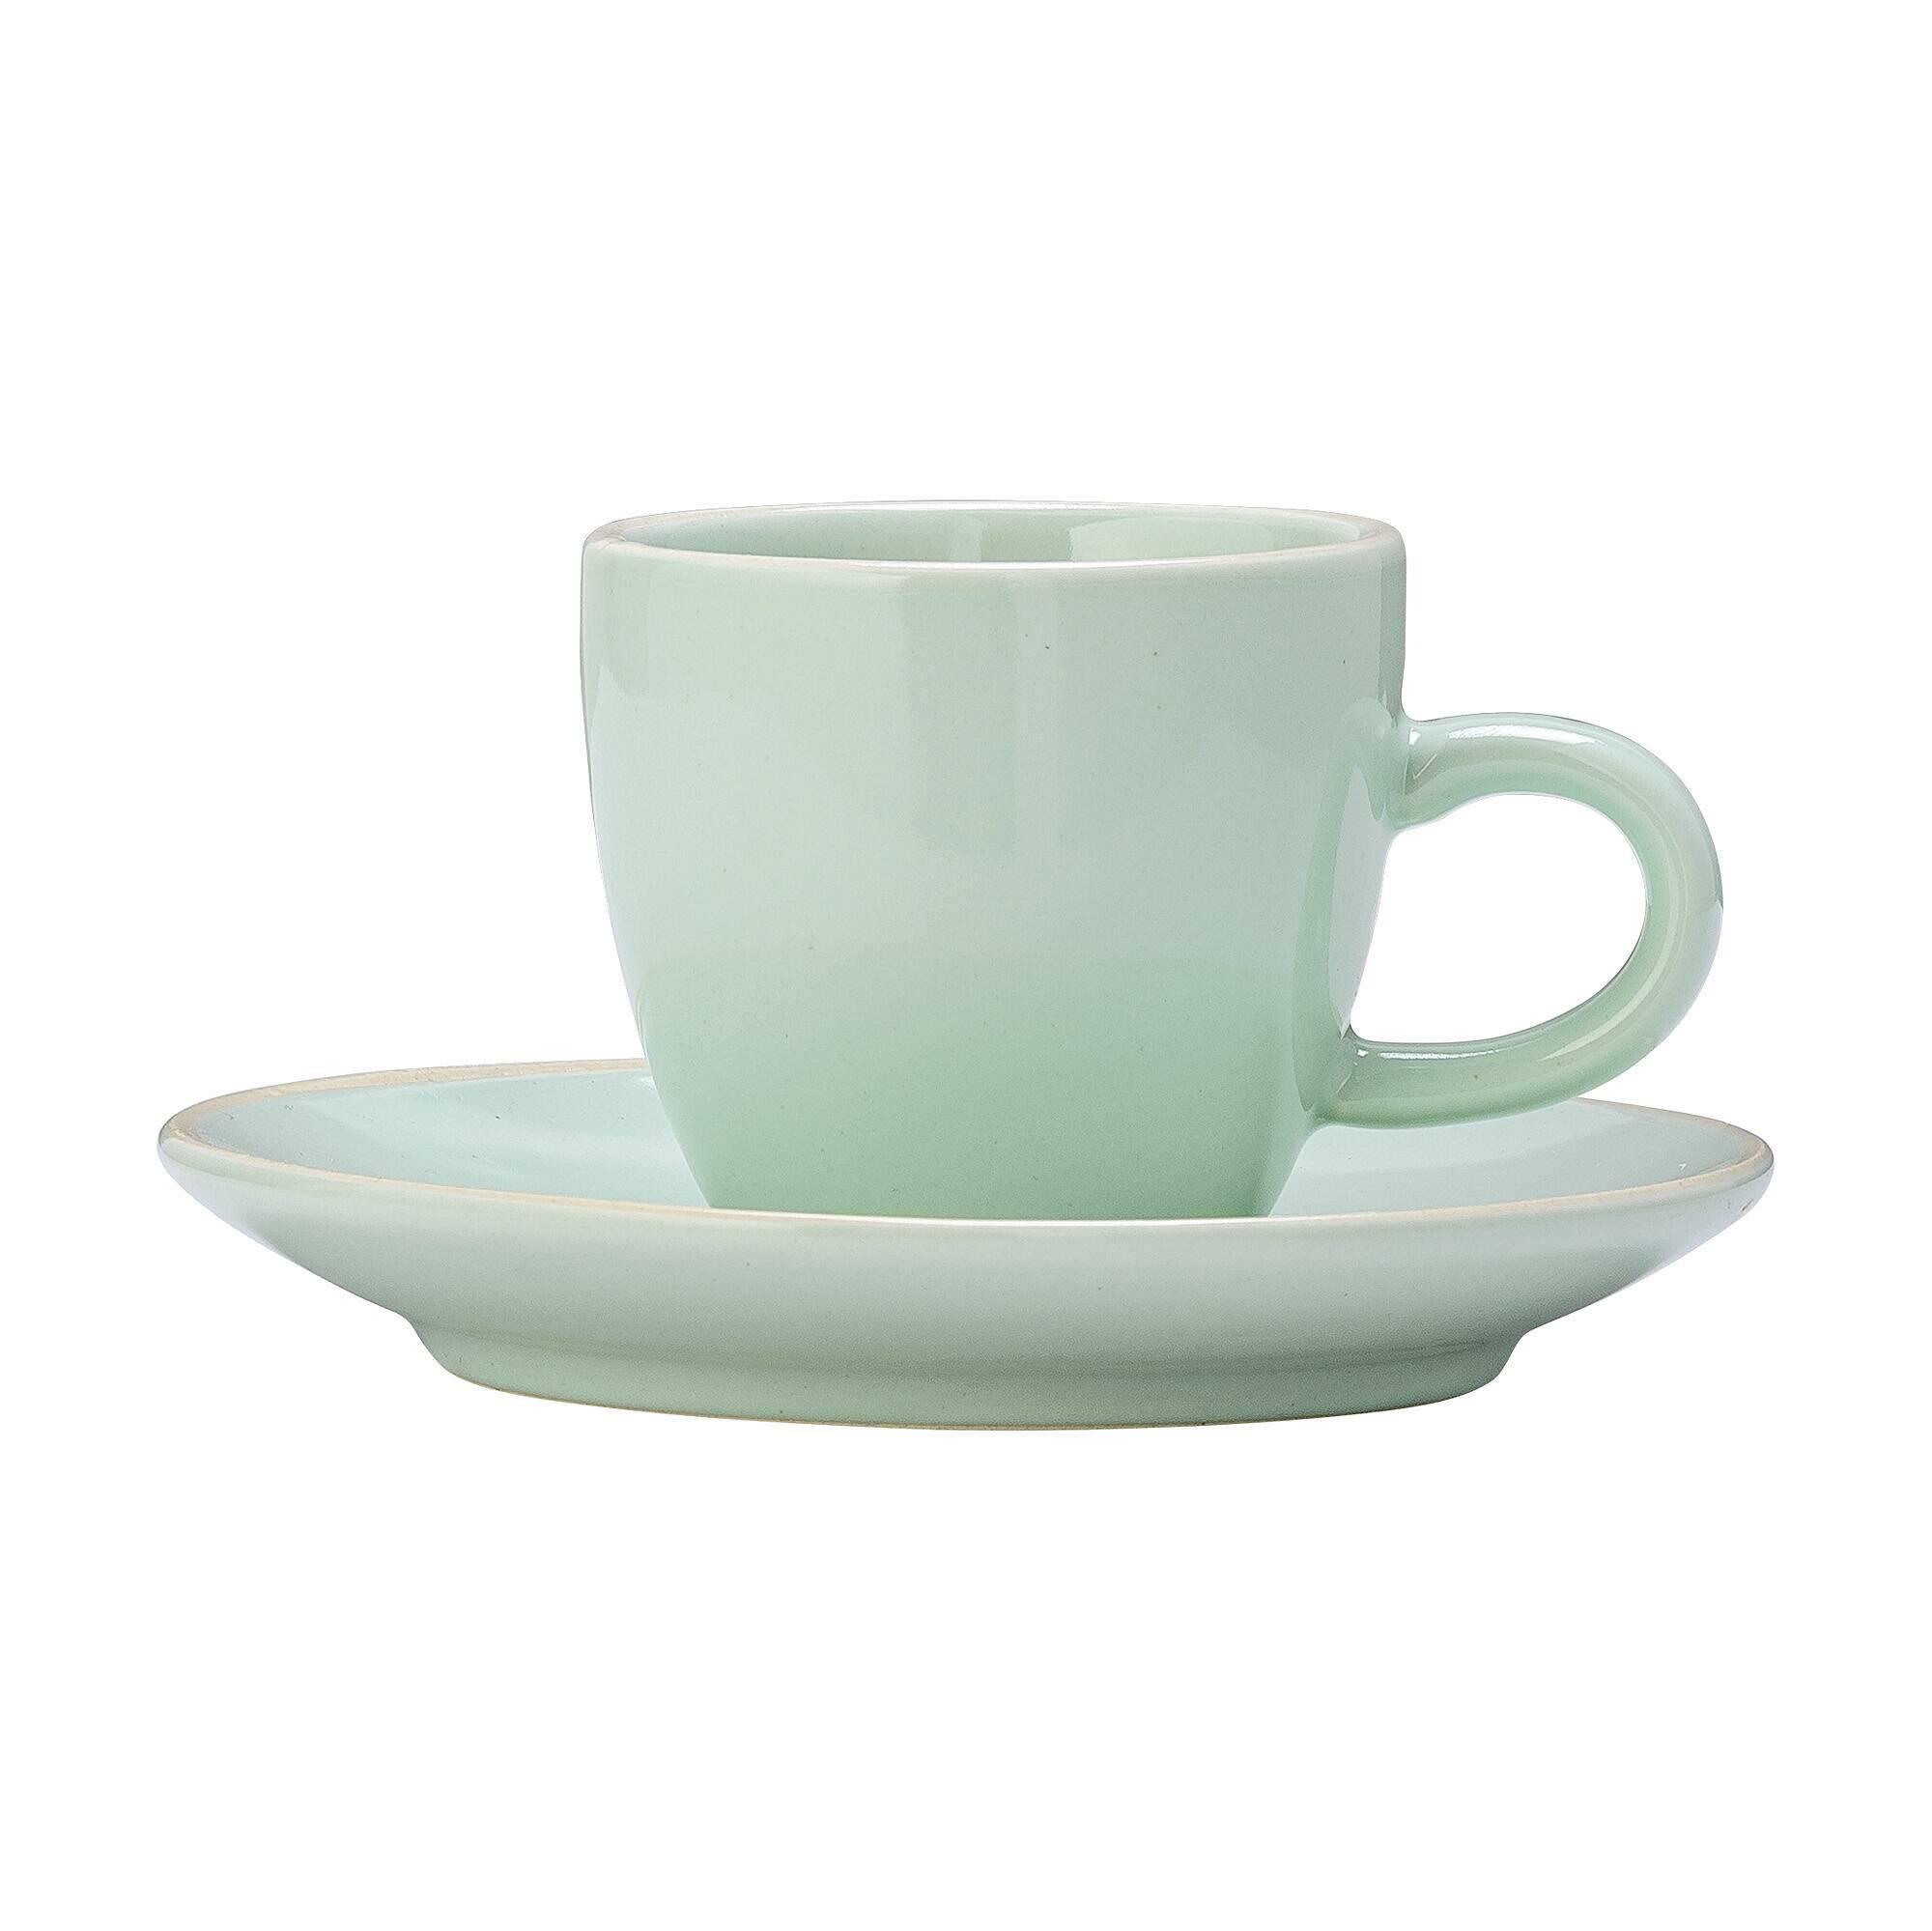 Чашка с блюдцем Bloomingville зеленаяПосуда<br><br><br>stock: 2<br>Высота: 5,5<br>Материал: Керамика<br>Цвет: Зелёный<br>Диаметр: 6; 11,5